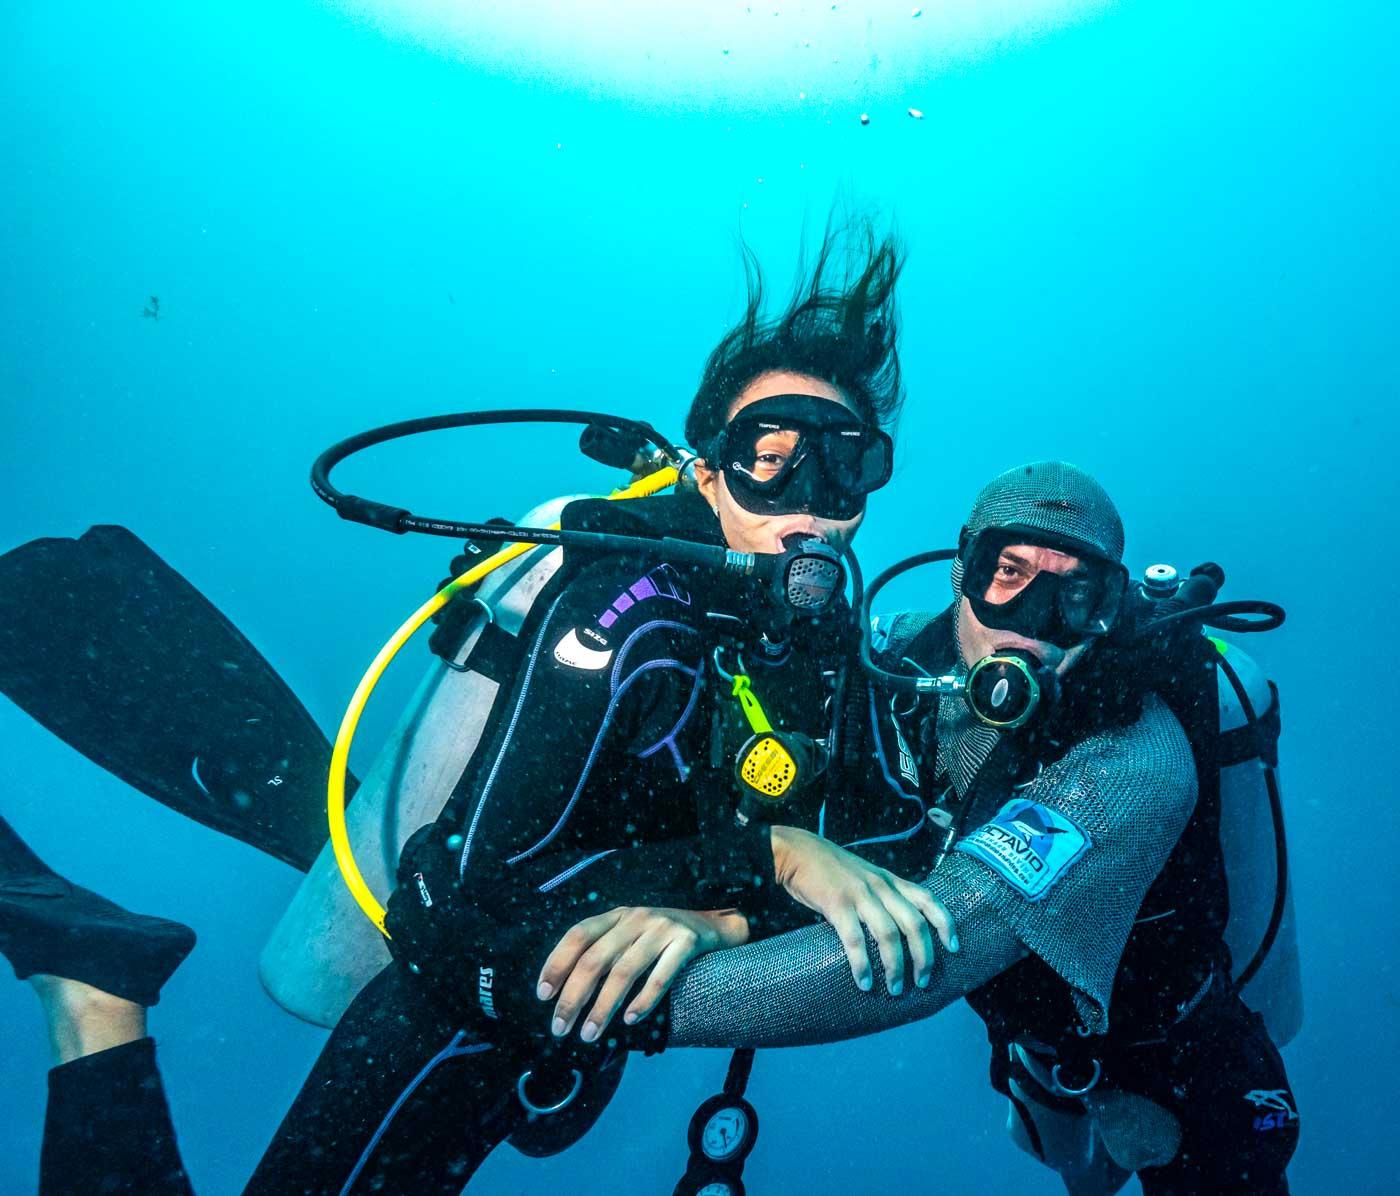 Scuba_Diving_With_Bull_Sharks_In_Playa_Del_Carmen_Mexico_Qintana_Roo_Yucatan_Peninsula_Riviera_Maya_Cozumel_Blog_The_Sassy_Pilgrim_Indian_Solo_Traveler_Girl_Scuba_Diver_Inia_Travel_Blogger_